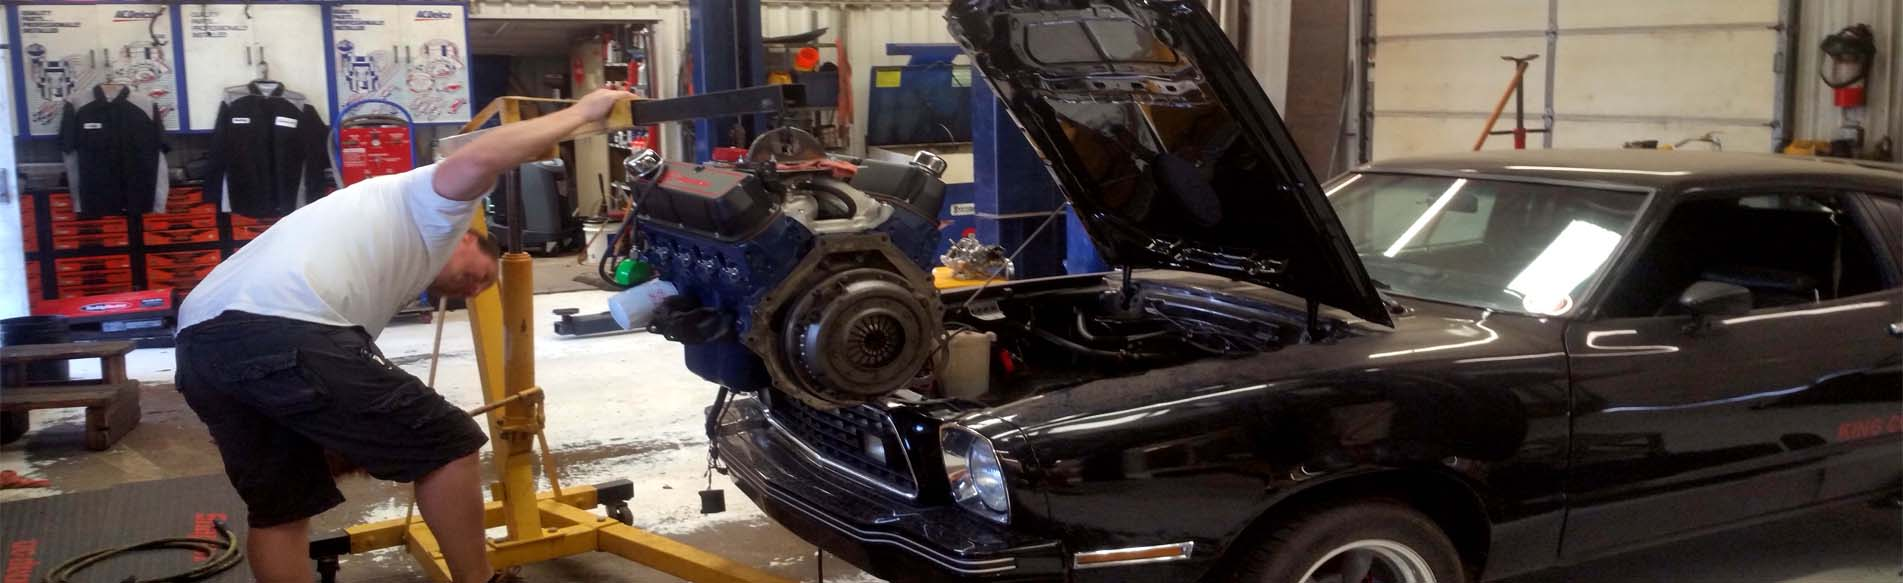 Spears automotive center expert auto repair cedar crest nm 87008 prev solutioingenieria Image collections